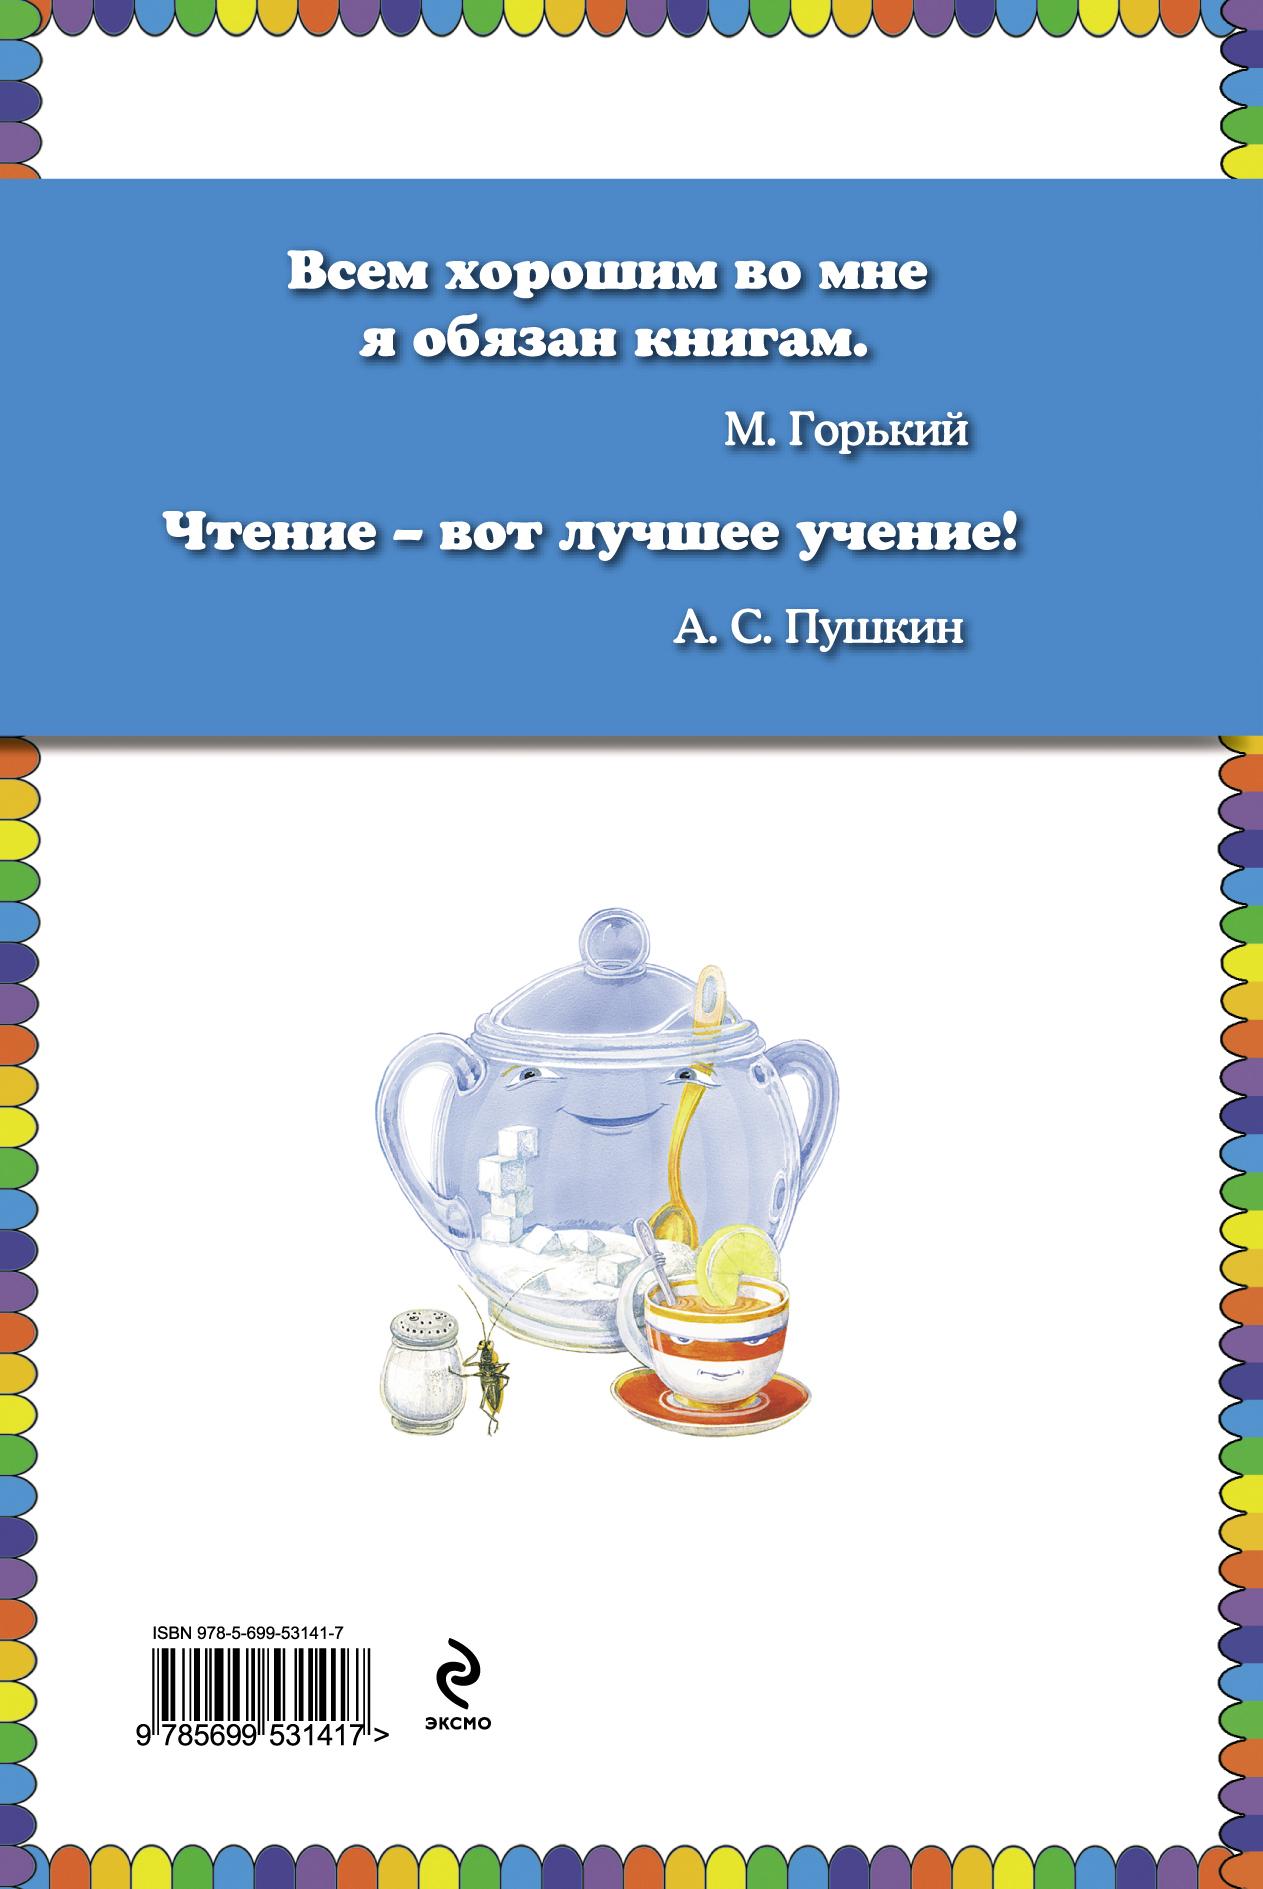 Максим Горький. Сказки